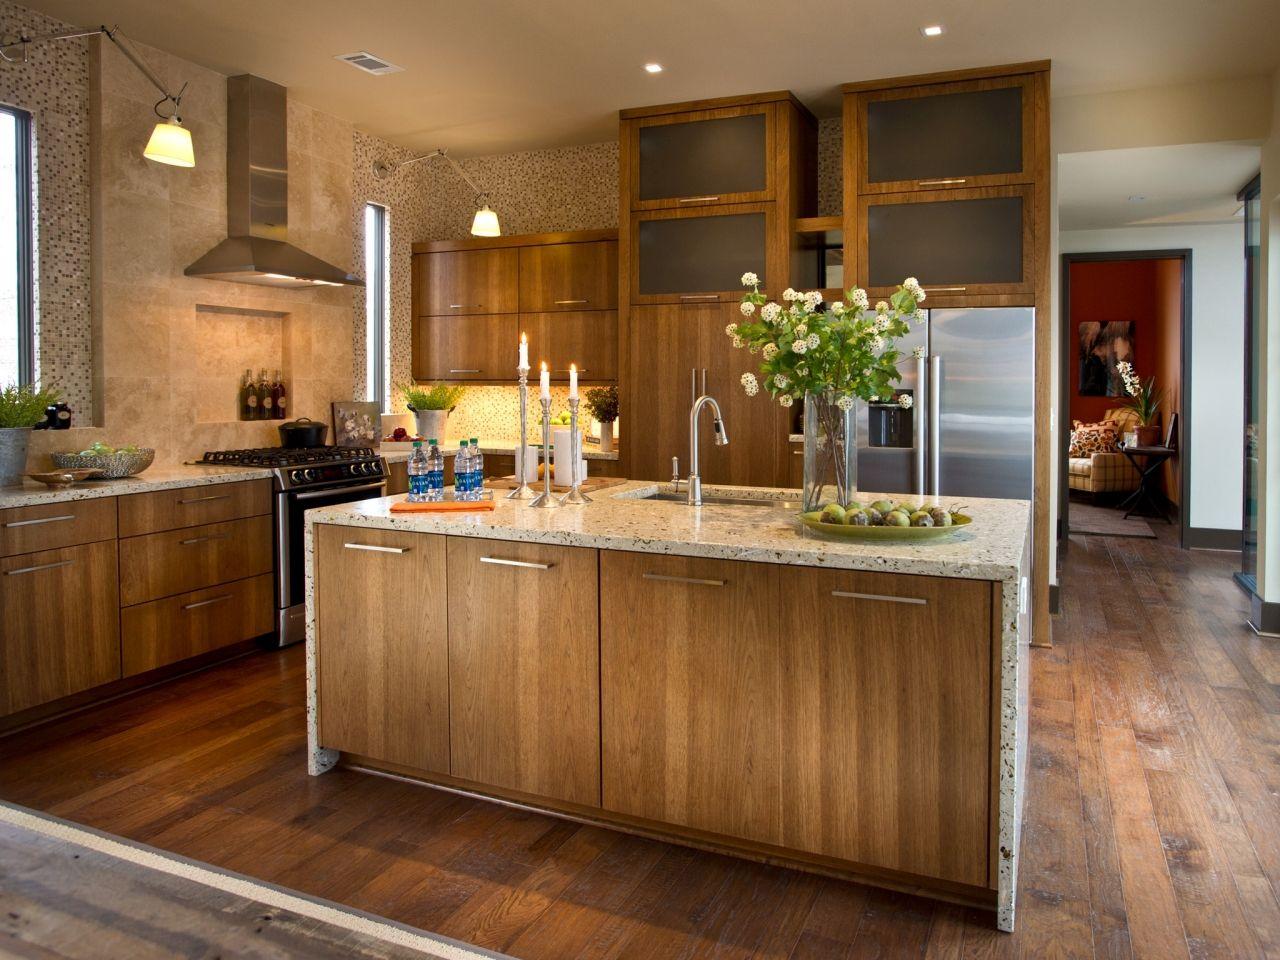 Custom Kitchen Designer Prepossessing ये 11 टिप्स किचन में करेंगे आपका काम Design Inspiration